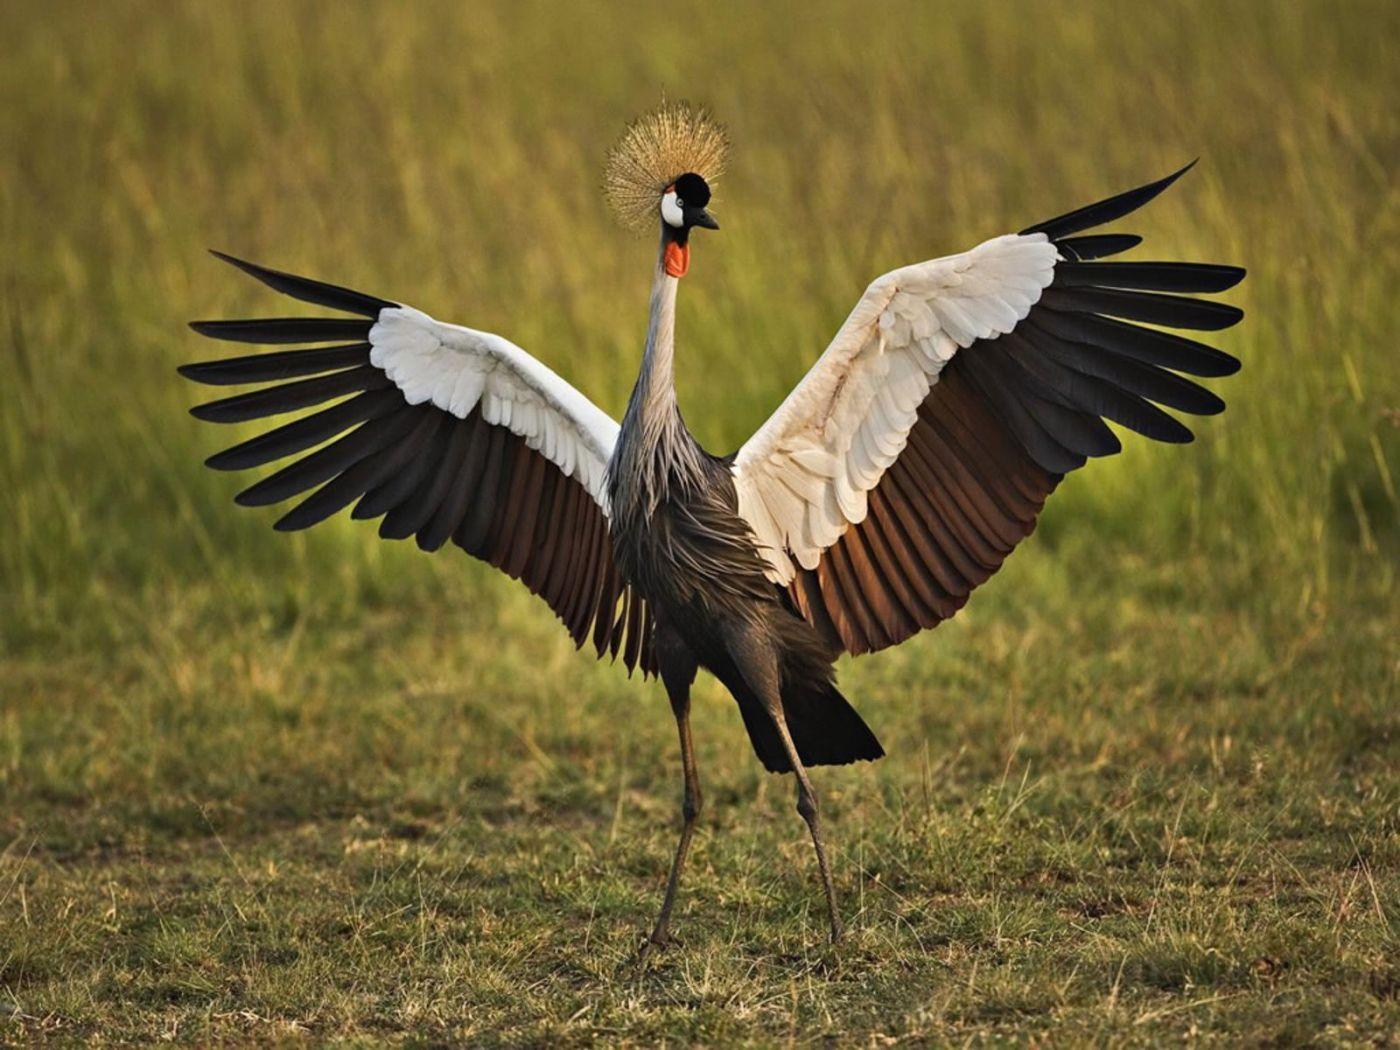 African Crowned Crane Wallpaper 1400x1050